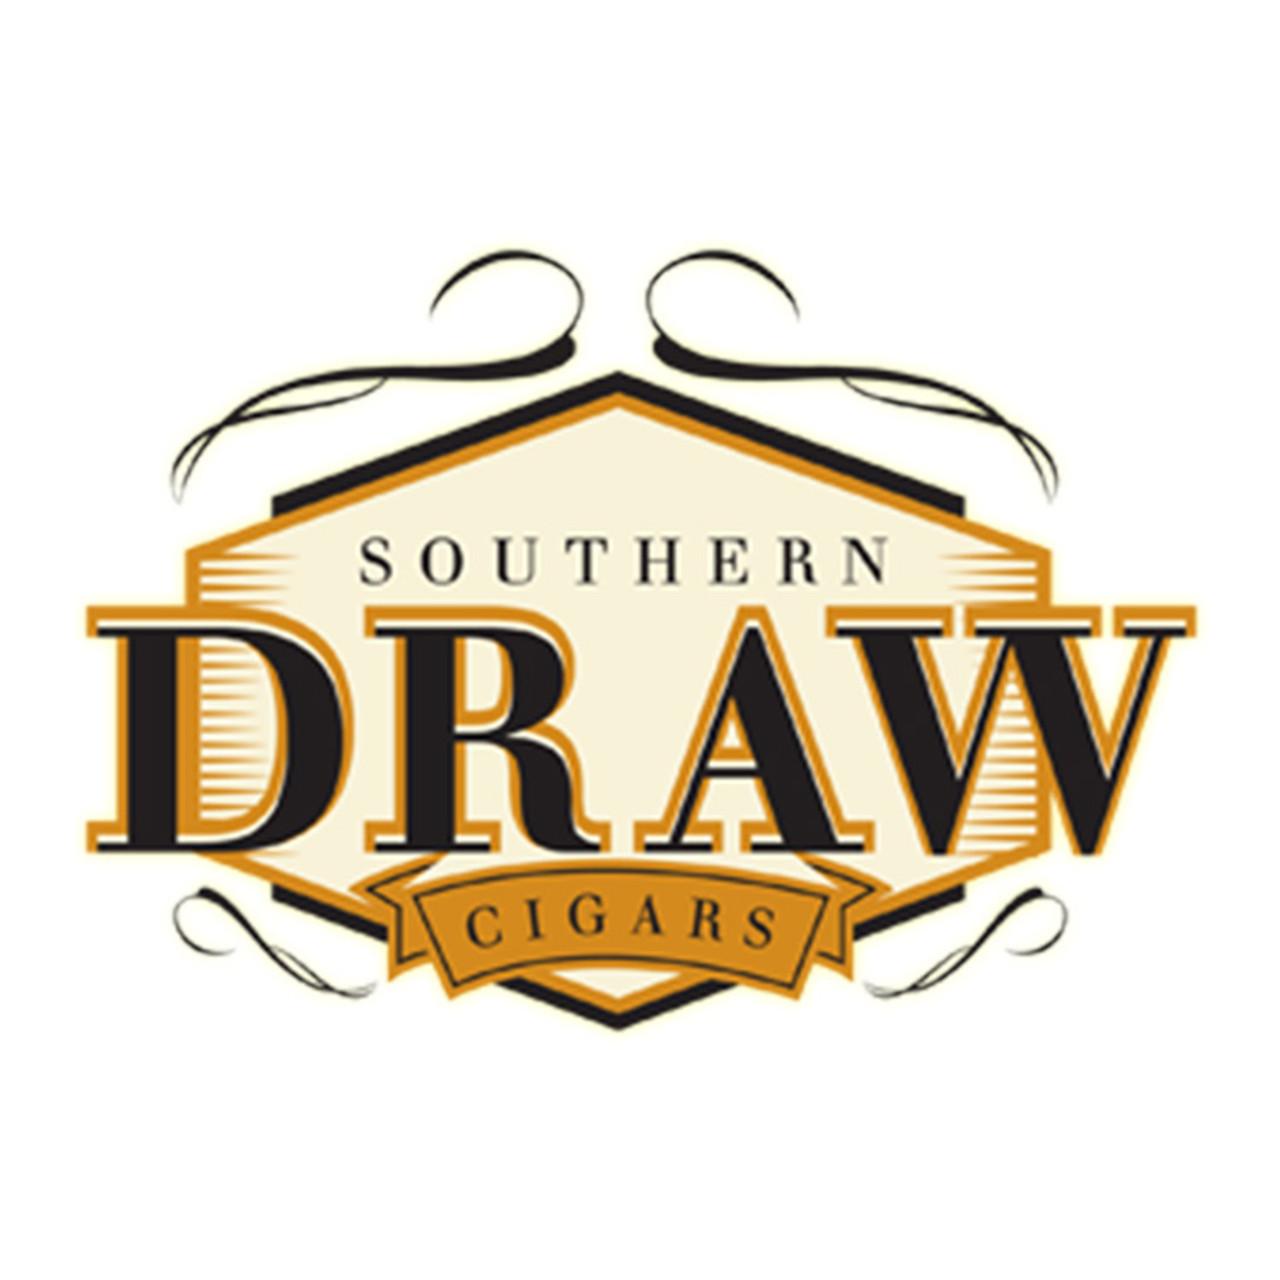 Southern Draw Rose Of Sharon Toro Drewpak Cigars - 6 x 52 (Pack of 5)